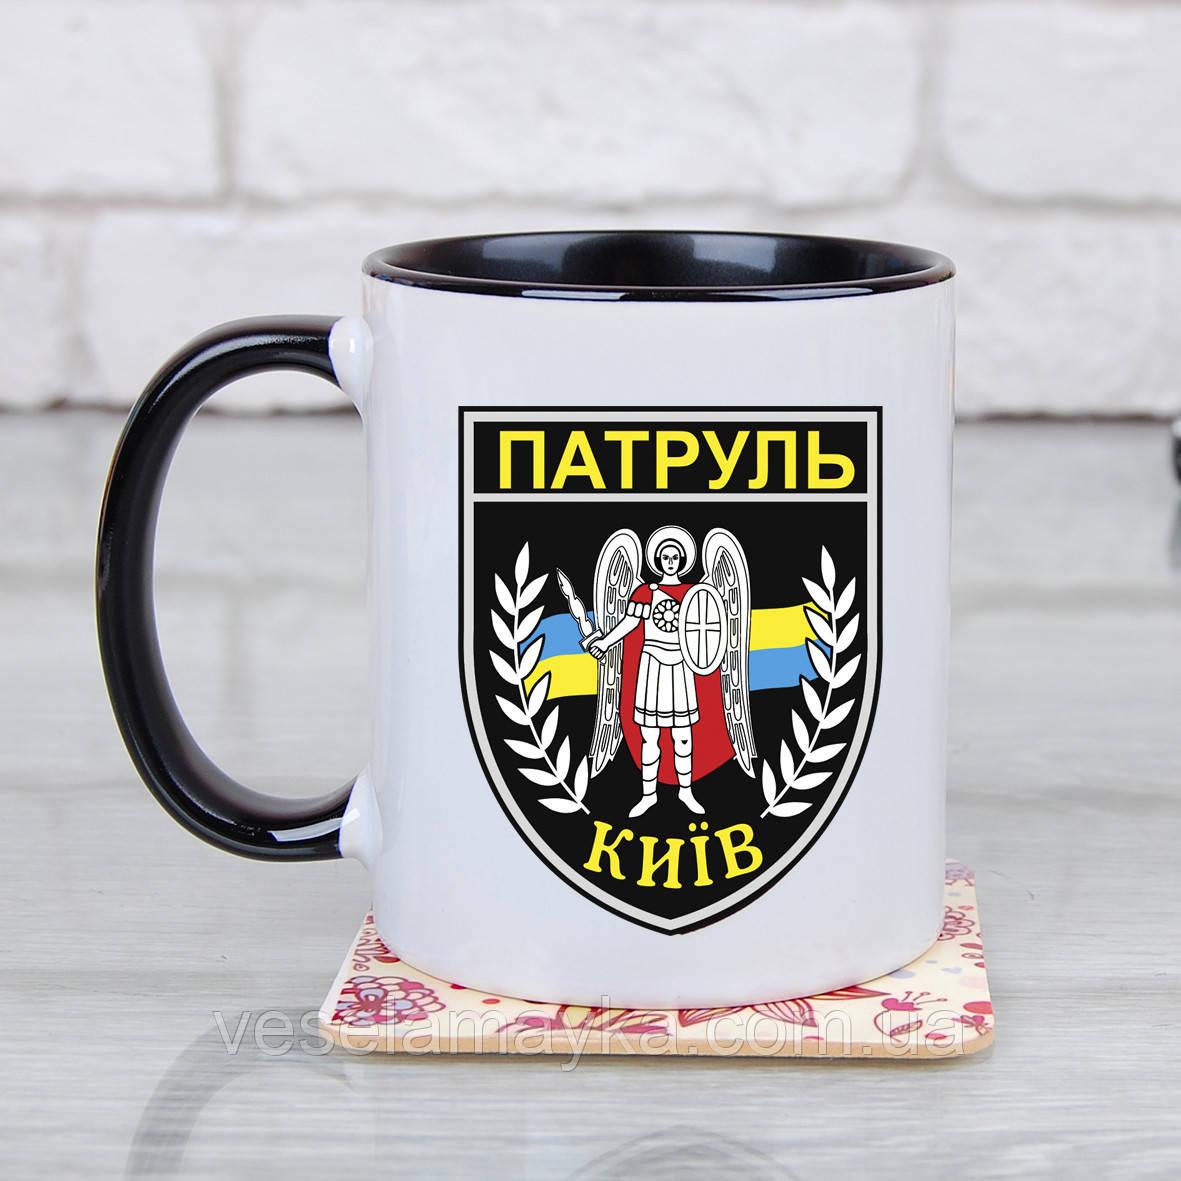 Чашка Шеврон полиции (Патруль Киев)